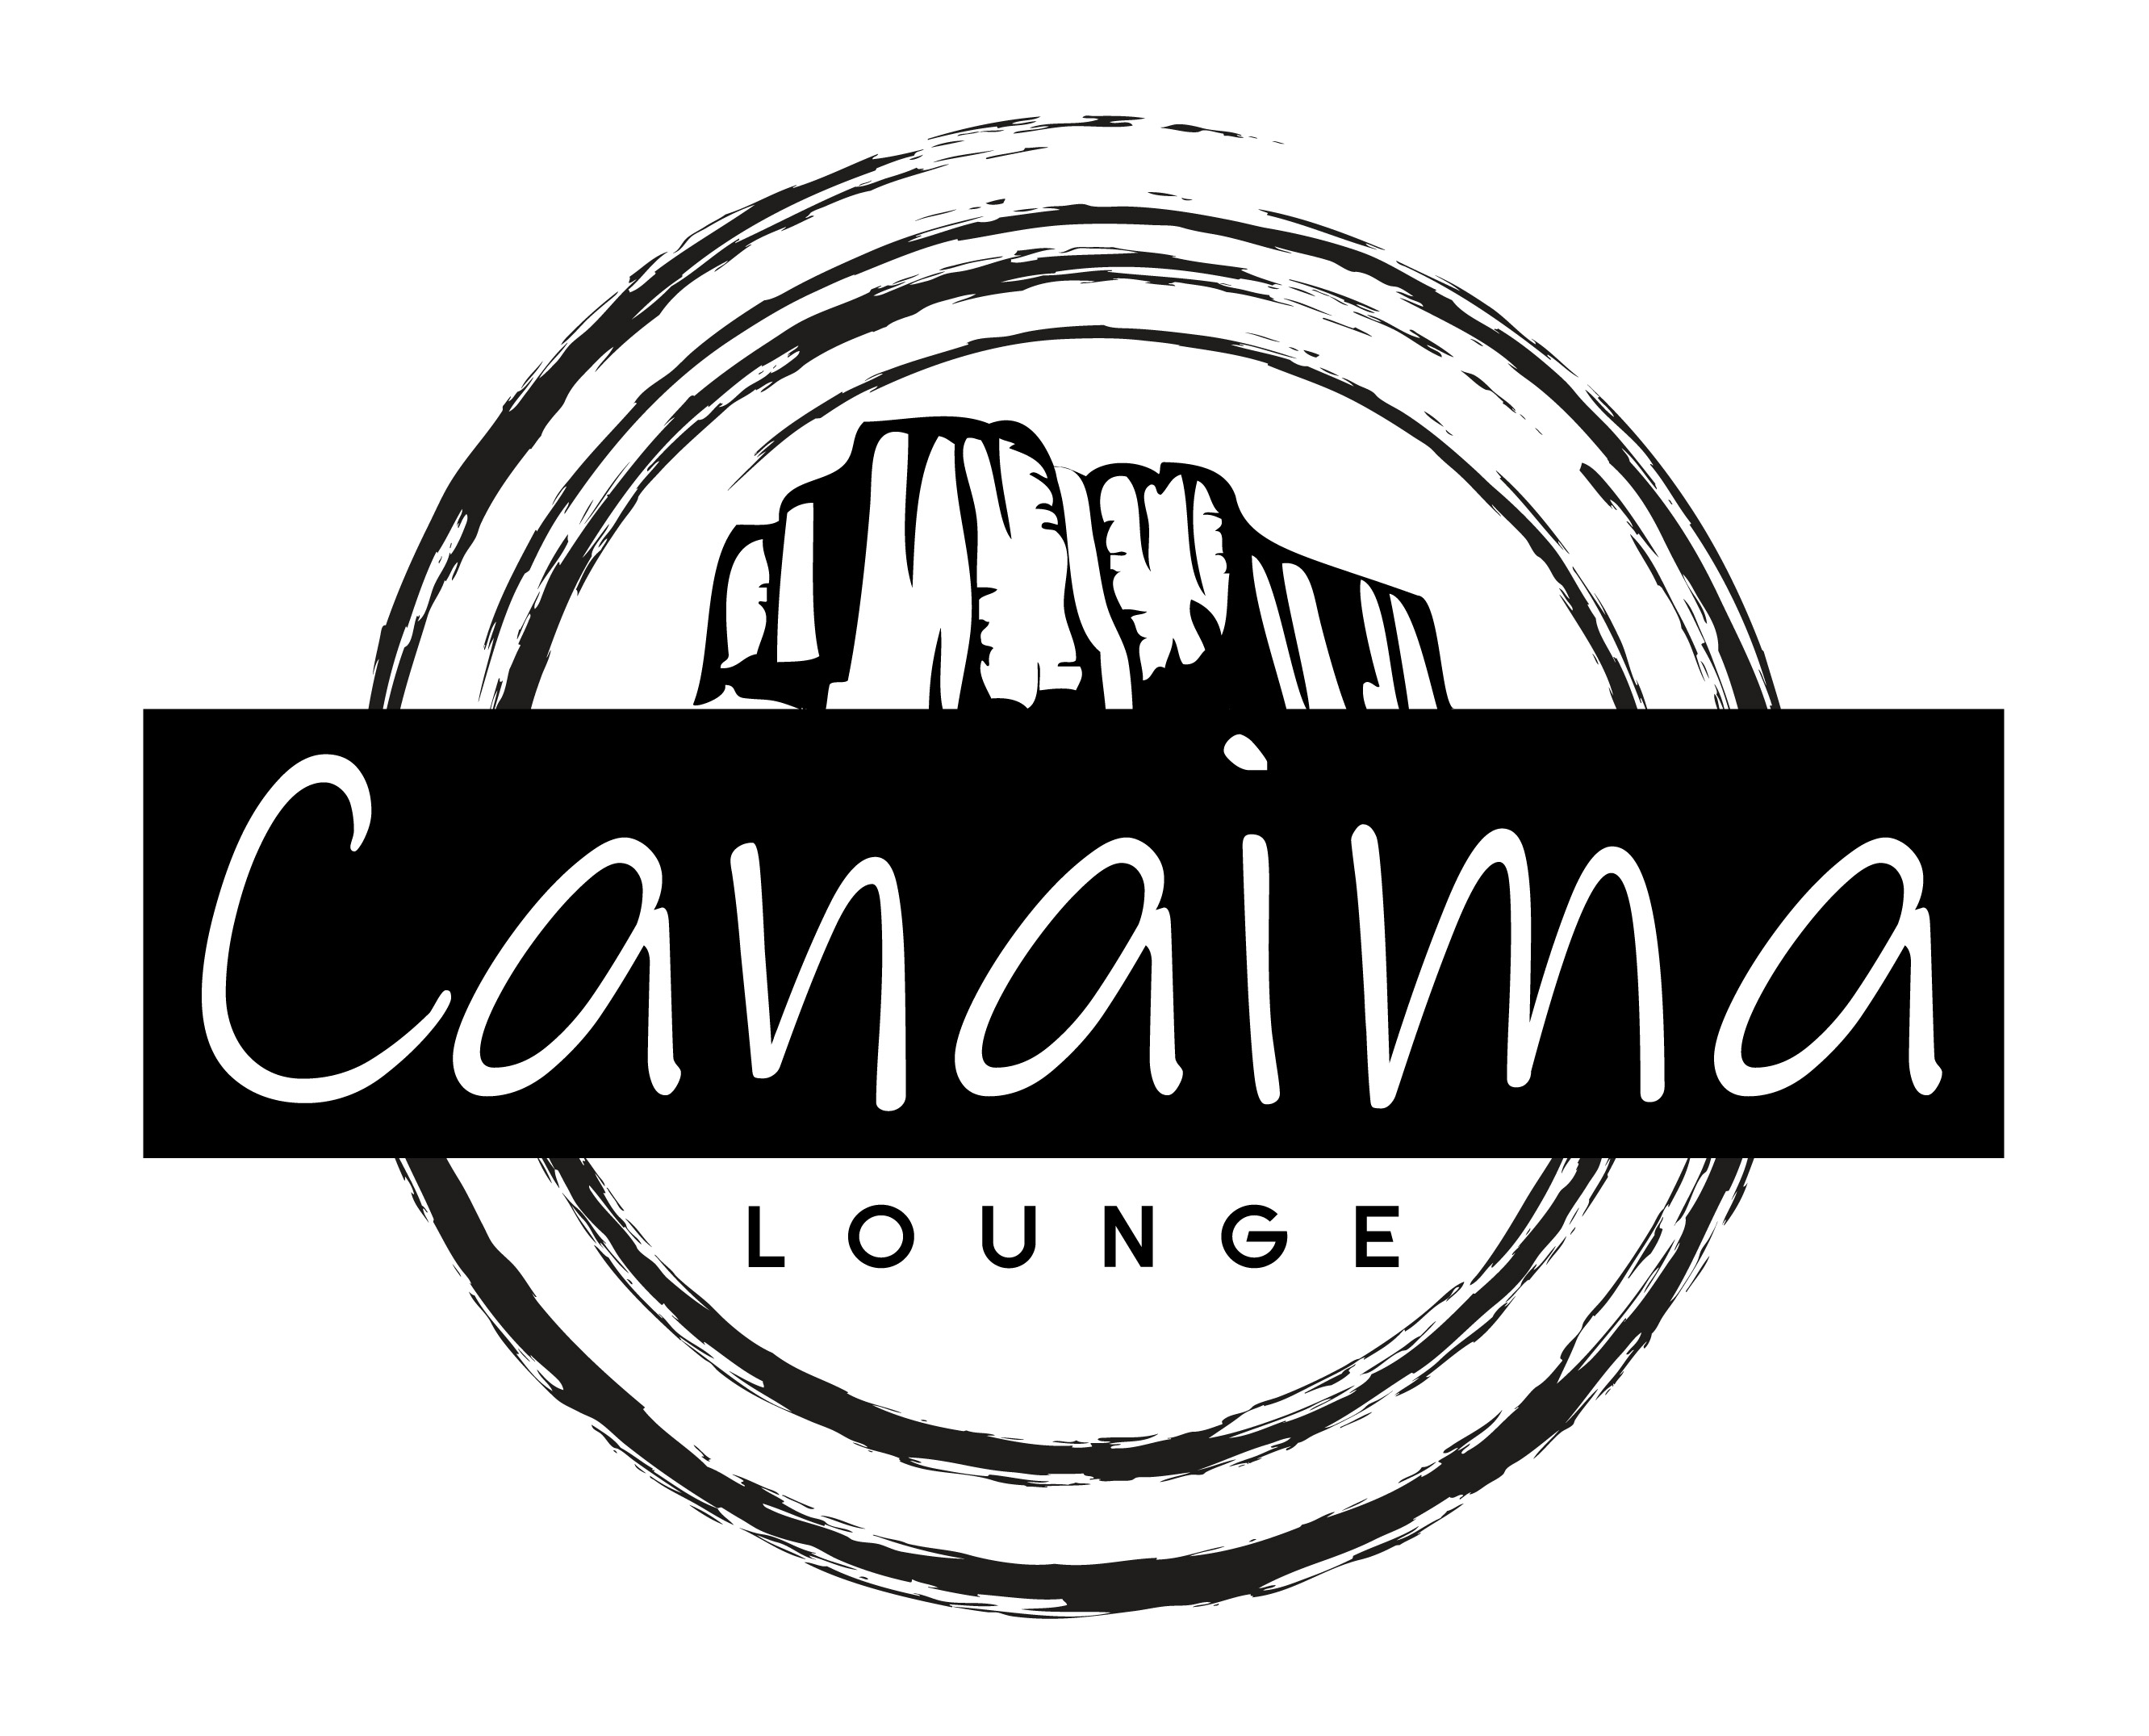 Canaima Lounge QrCarta